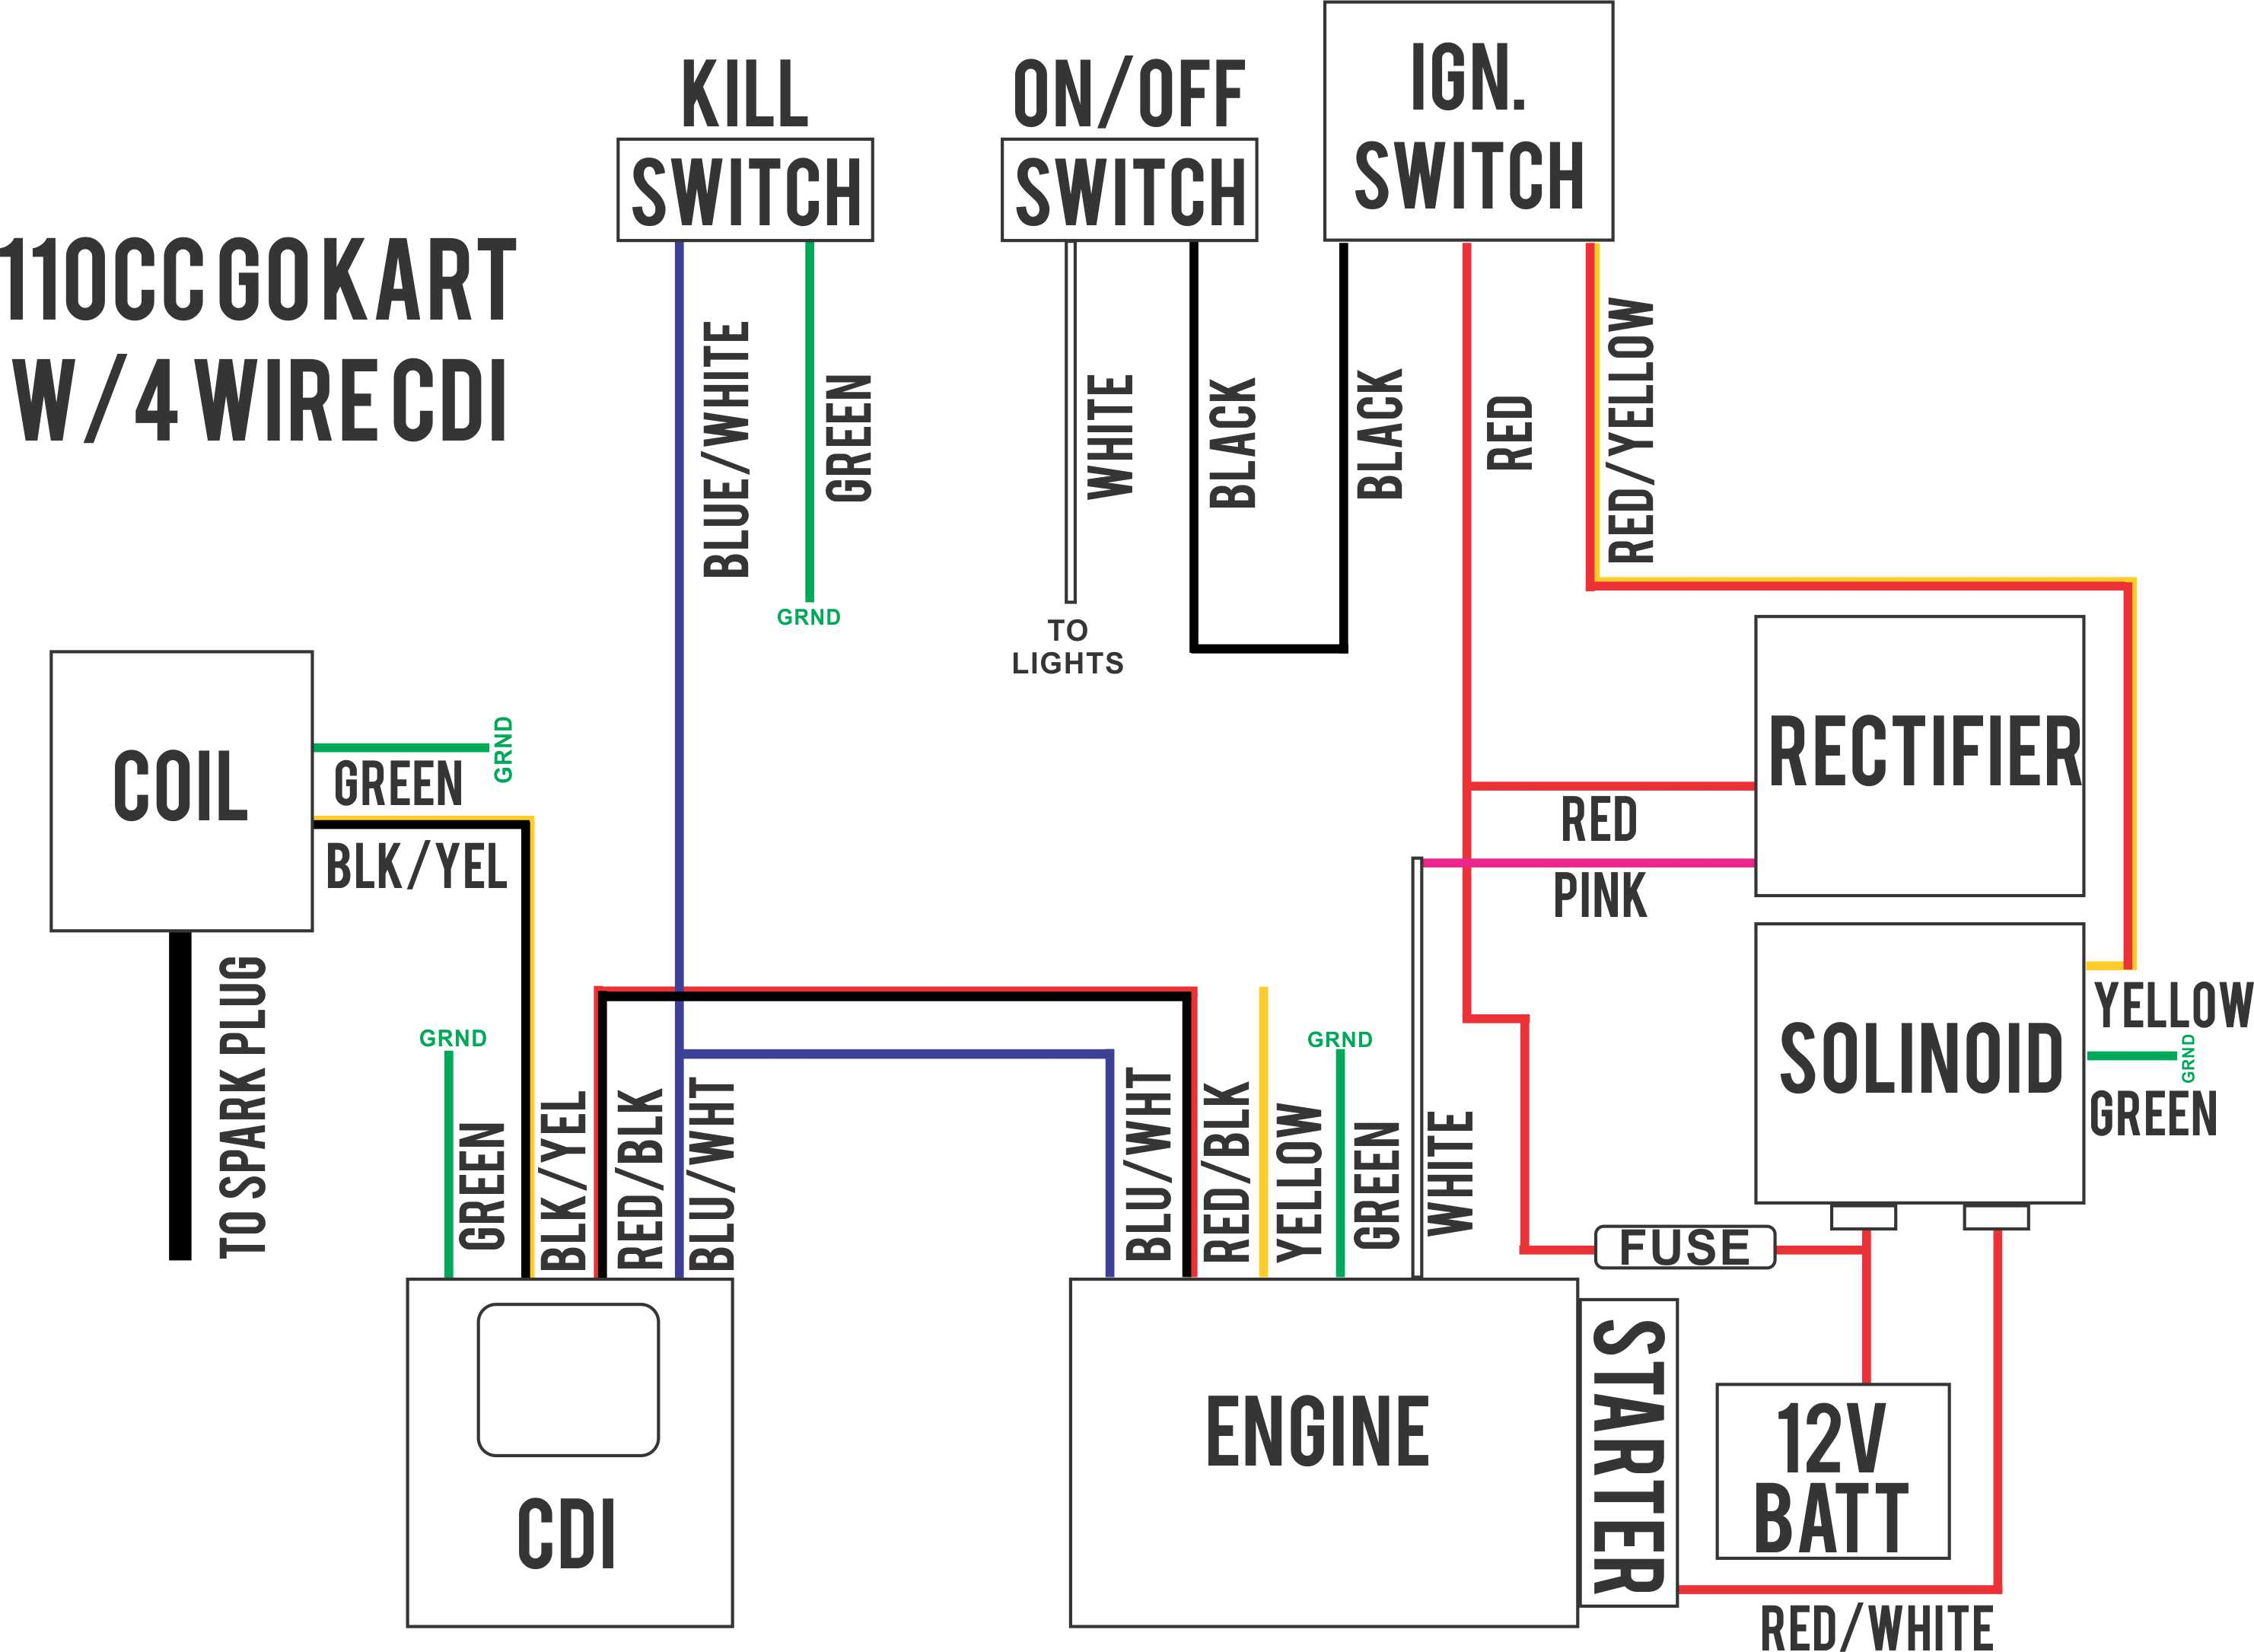 Motorcycle Ignition Schematic - Wiring Diagrams Hubs - Onan Generator Remote Start Switch Wiring Diagram